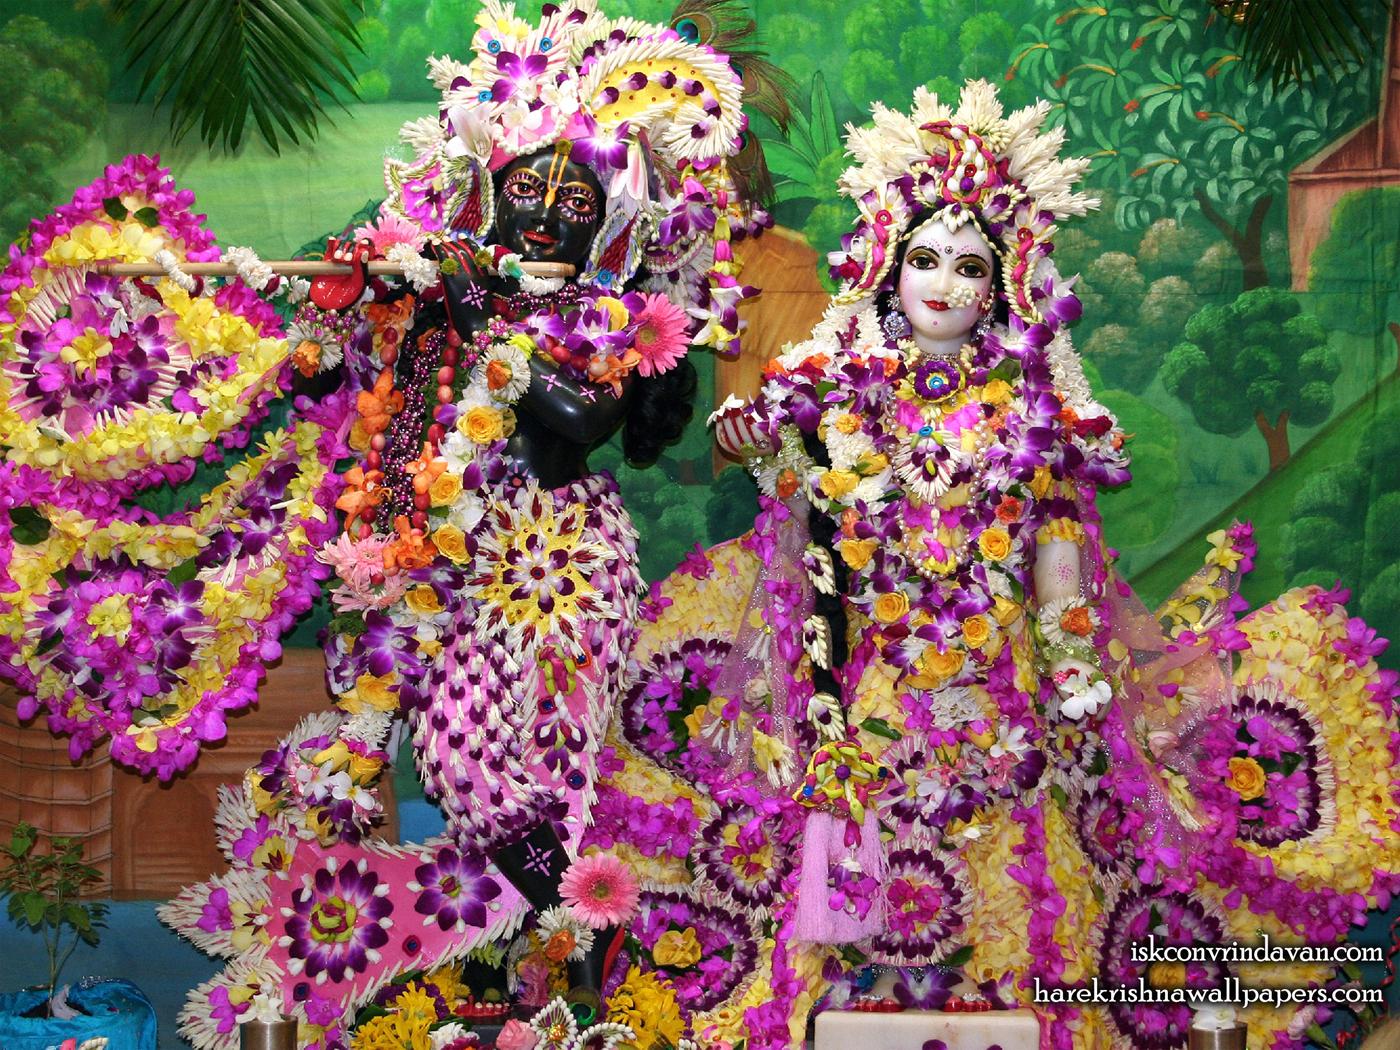 Sri Sri Radha Shyamsundar Wallpaper (010) Size 1400x1050 Download